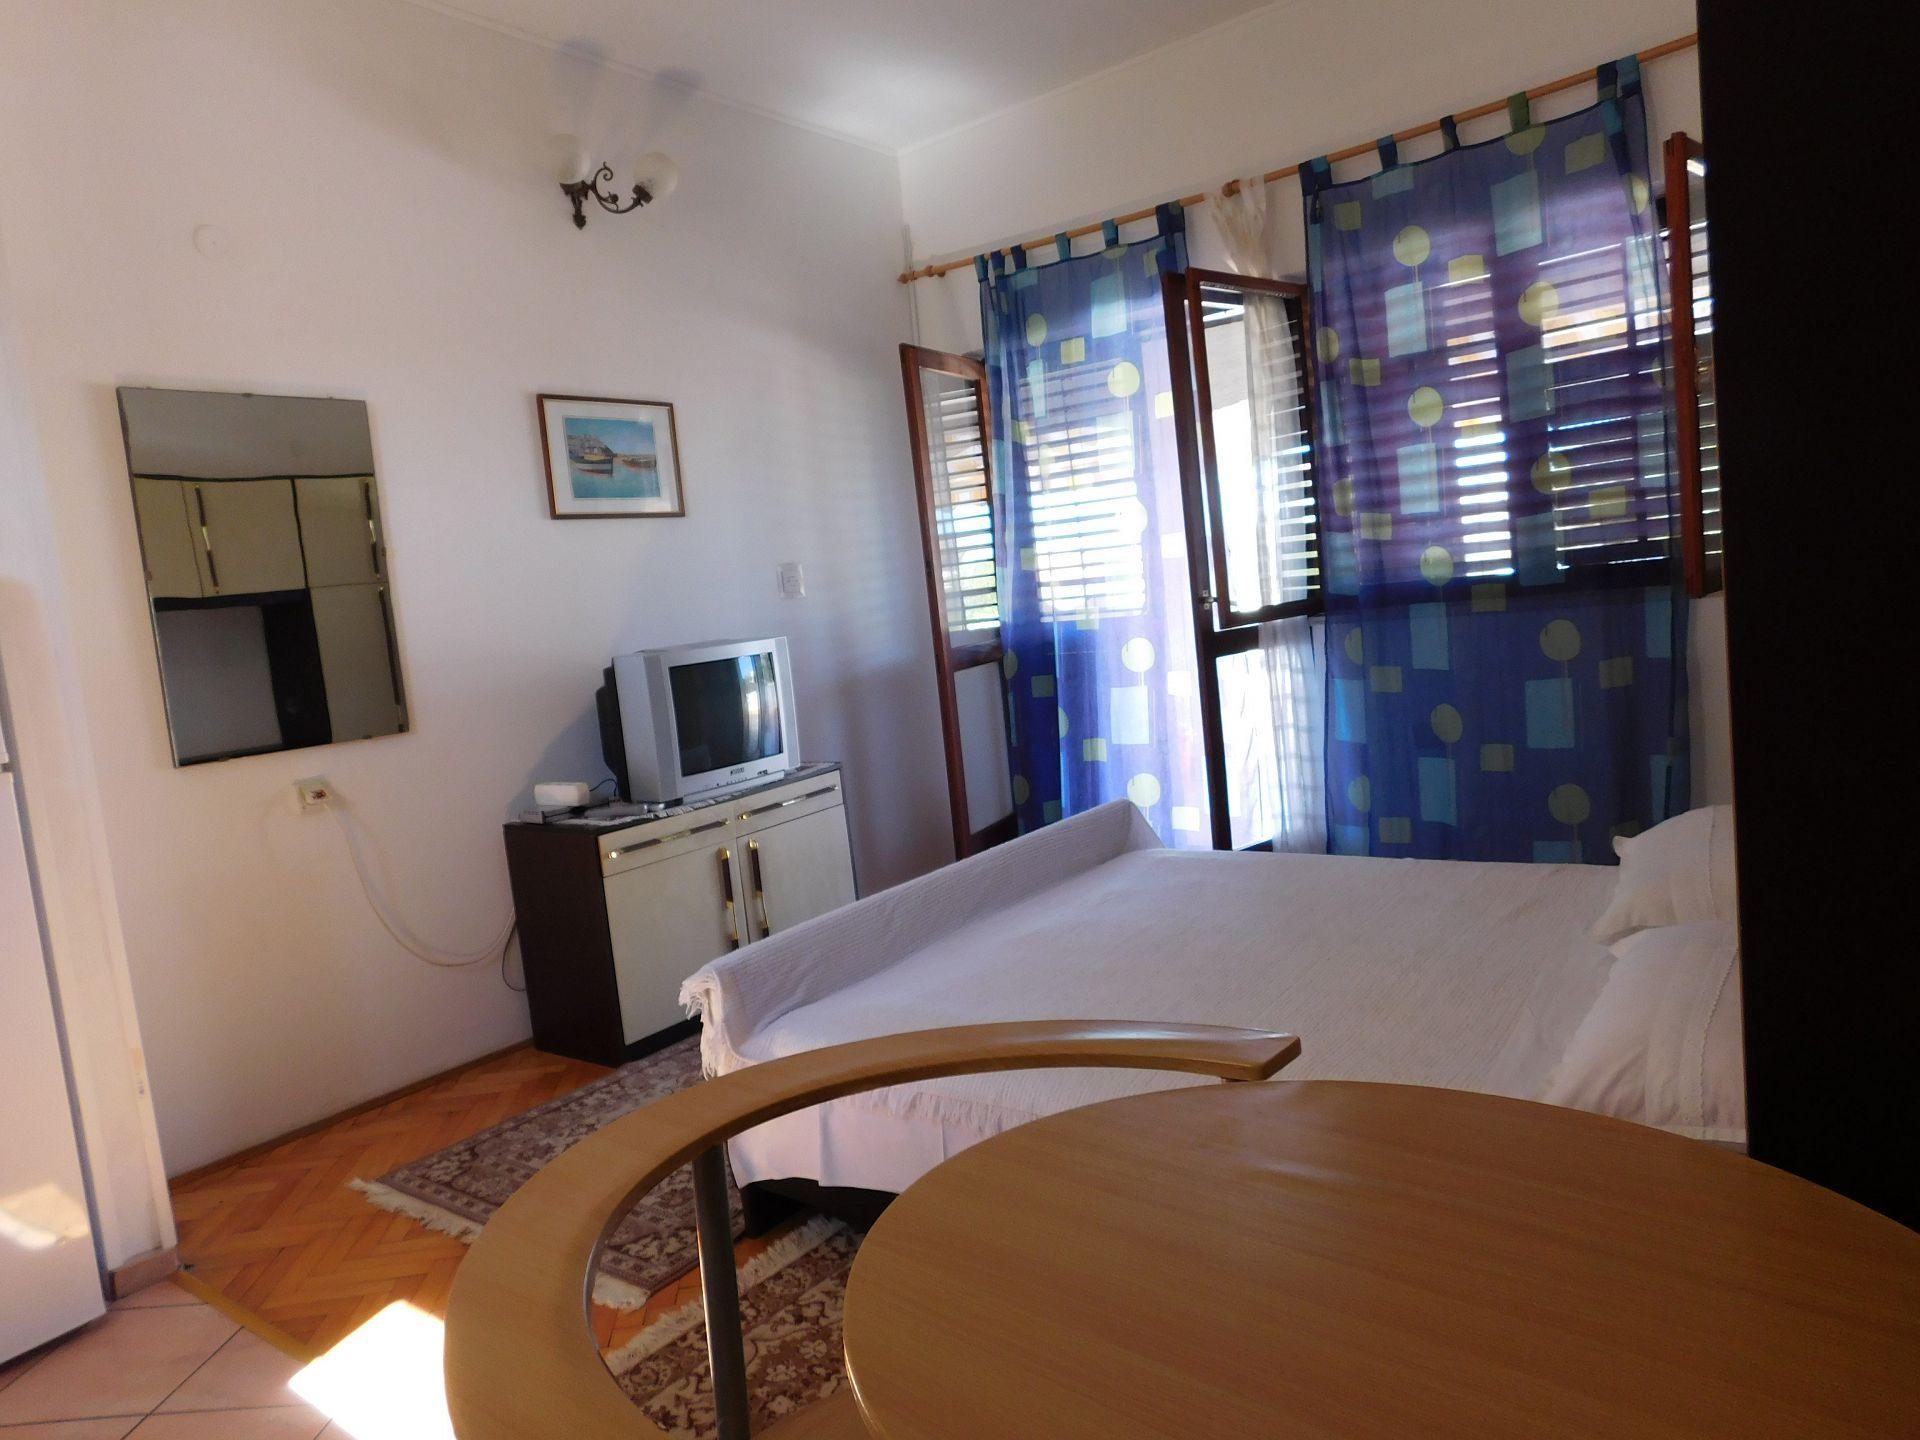 Ferienwohnung Lado SA2(2+1) - Muline (741847), Ugljan, Insel Ugljan, Dalmatien, Kroatien, Bild 14